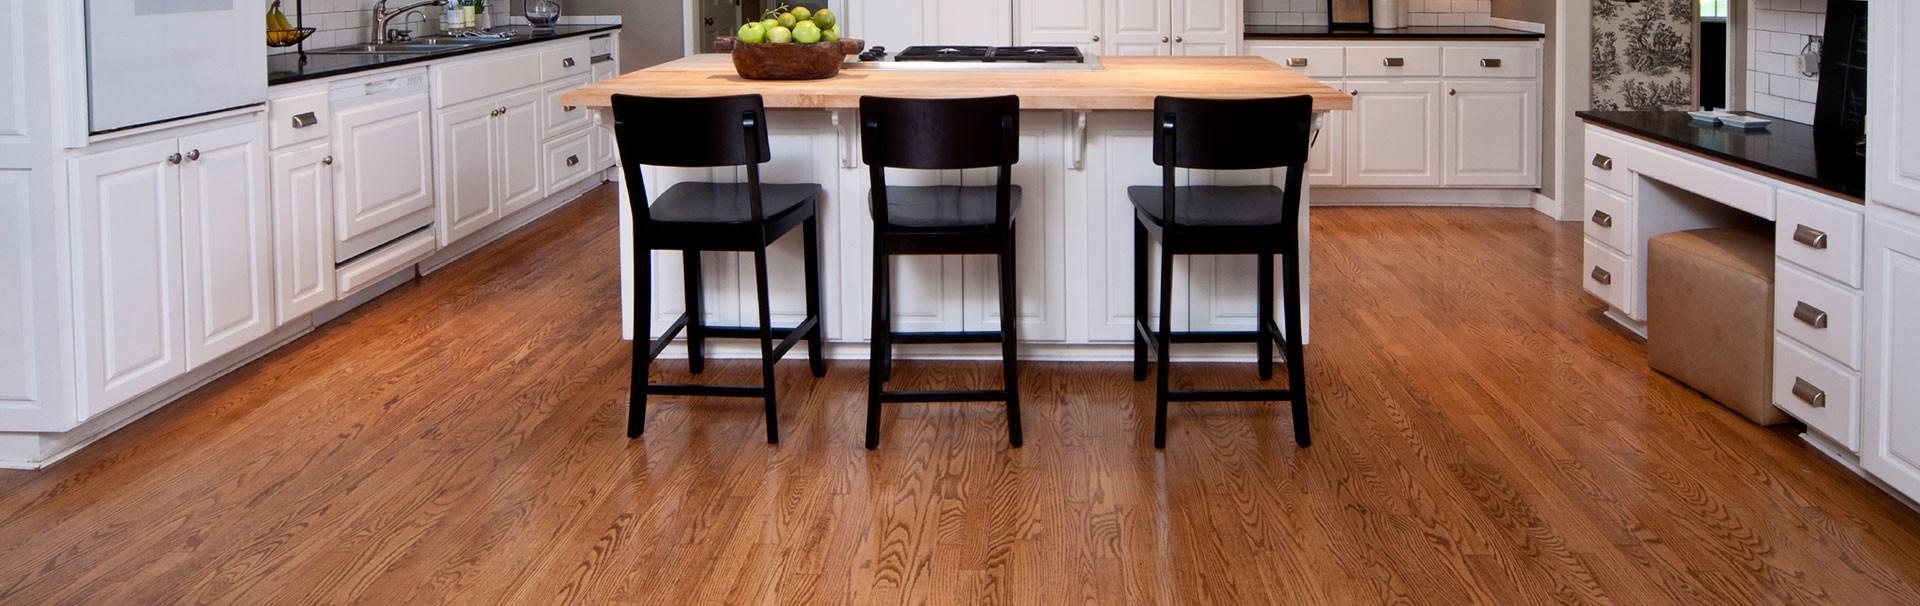 hardwood-floor-installation-1920x610